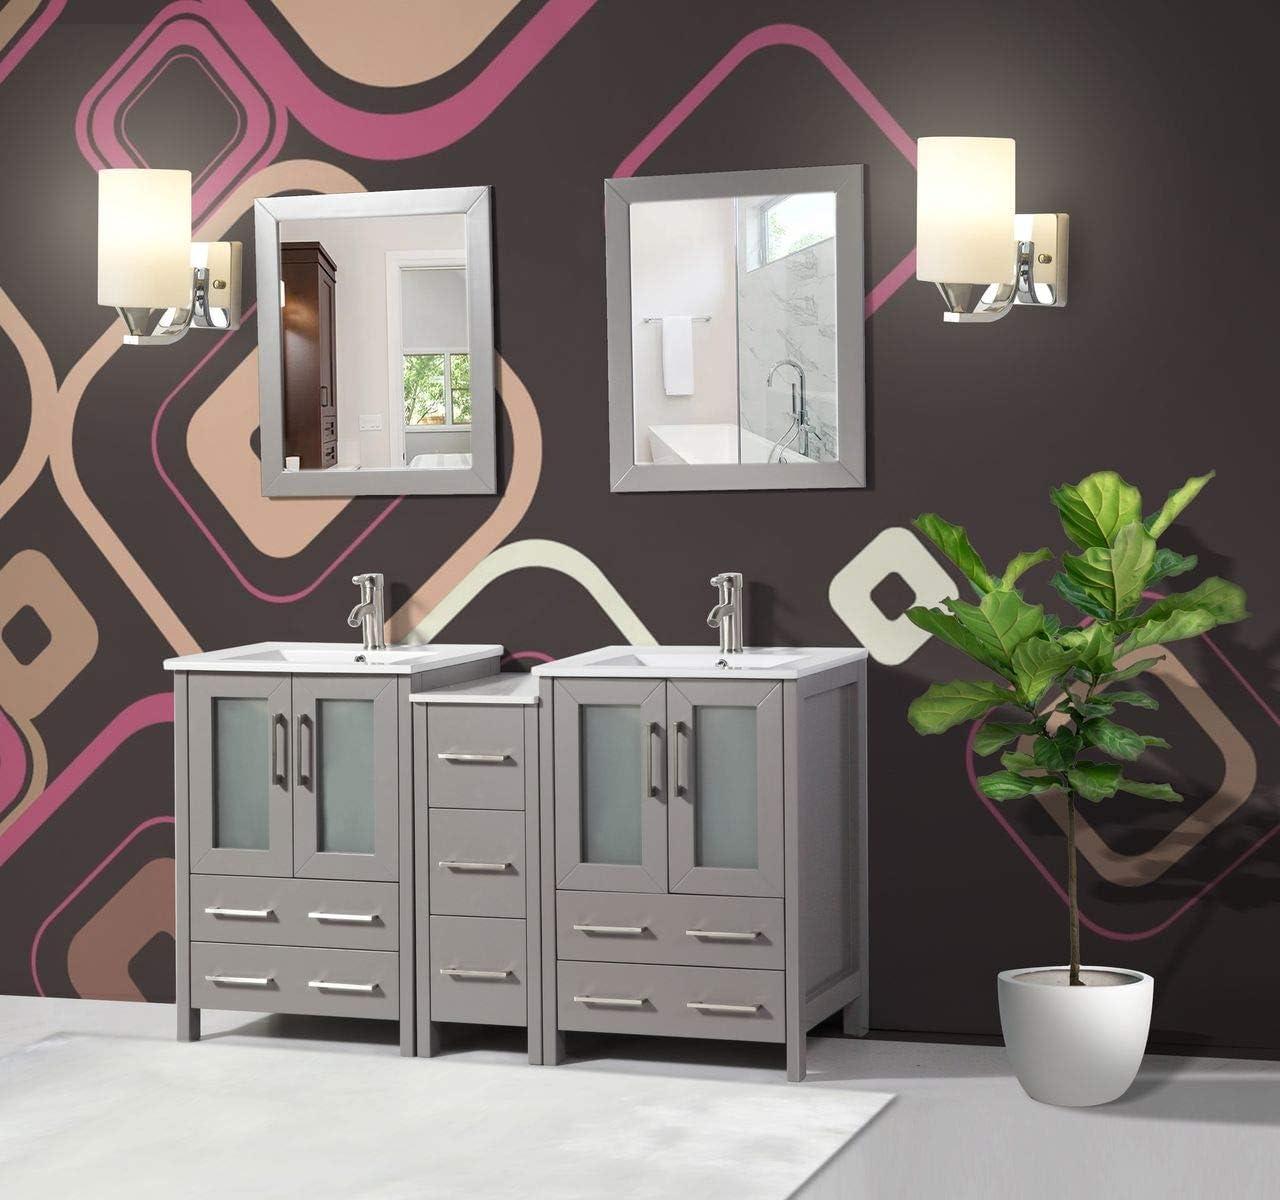 Amazon Com Vanity Art 60 Inch Double Sink Bathroom Vanity Combo Set 1 Side Cabinet 2 Shelves 7 Drawers Ceramic Top Bathroom Cabinet With Free Mirror Va3024 60 G Kitchen Dining